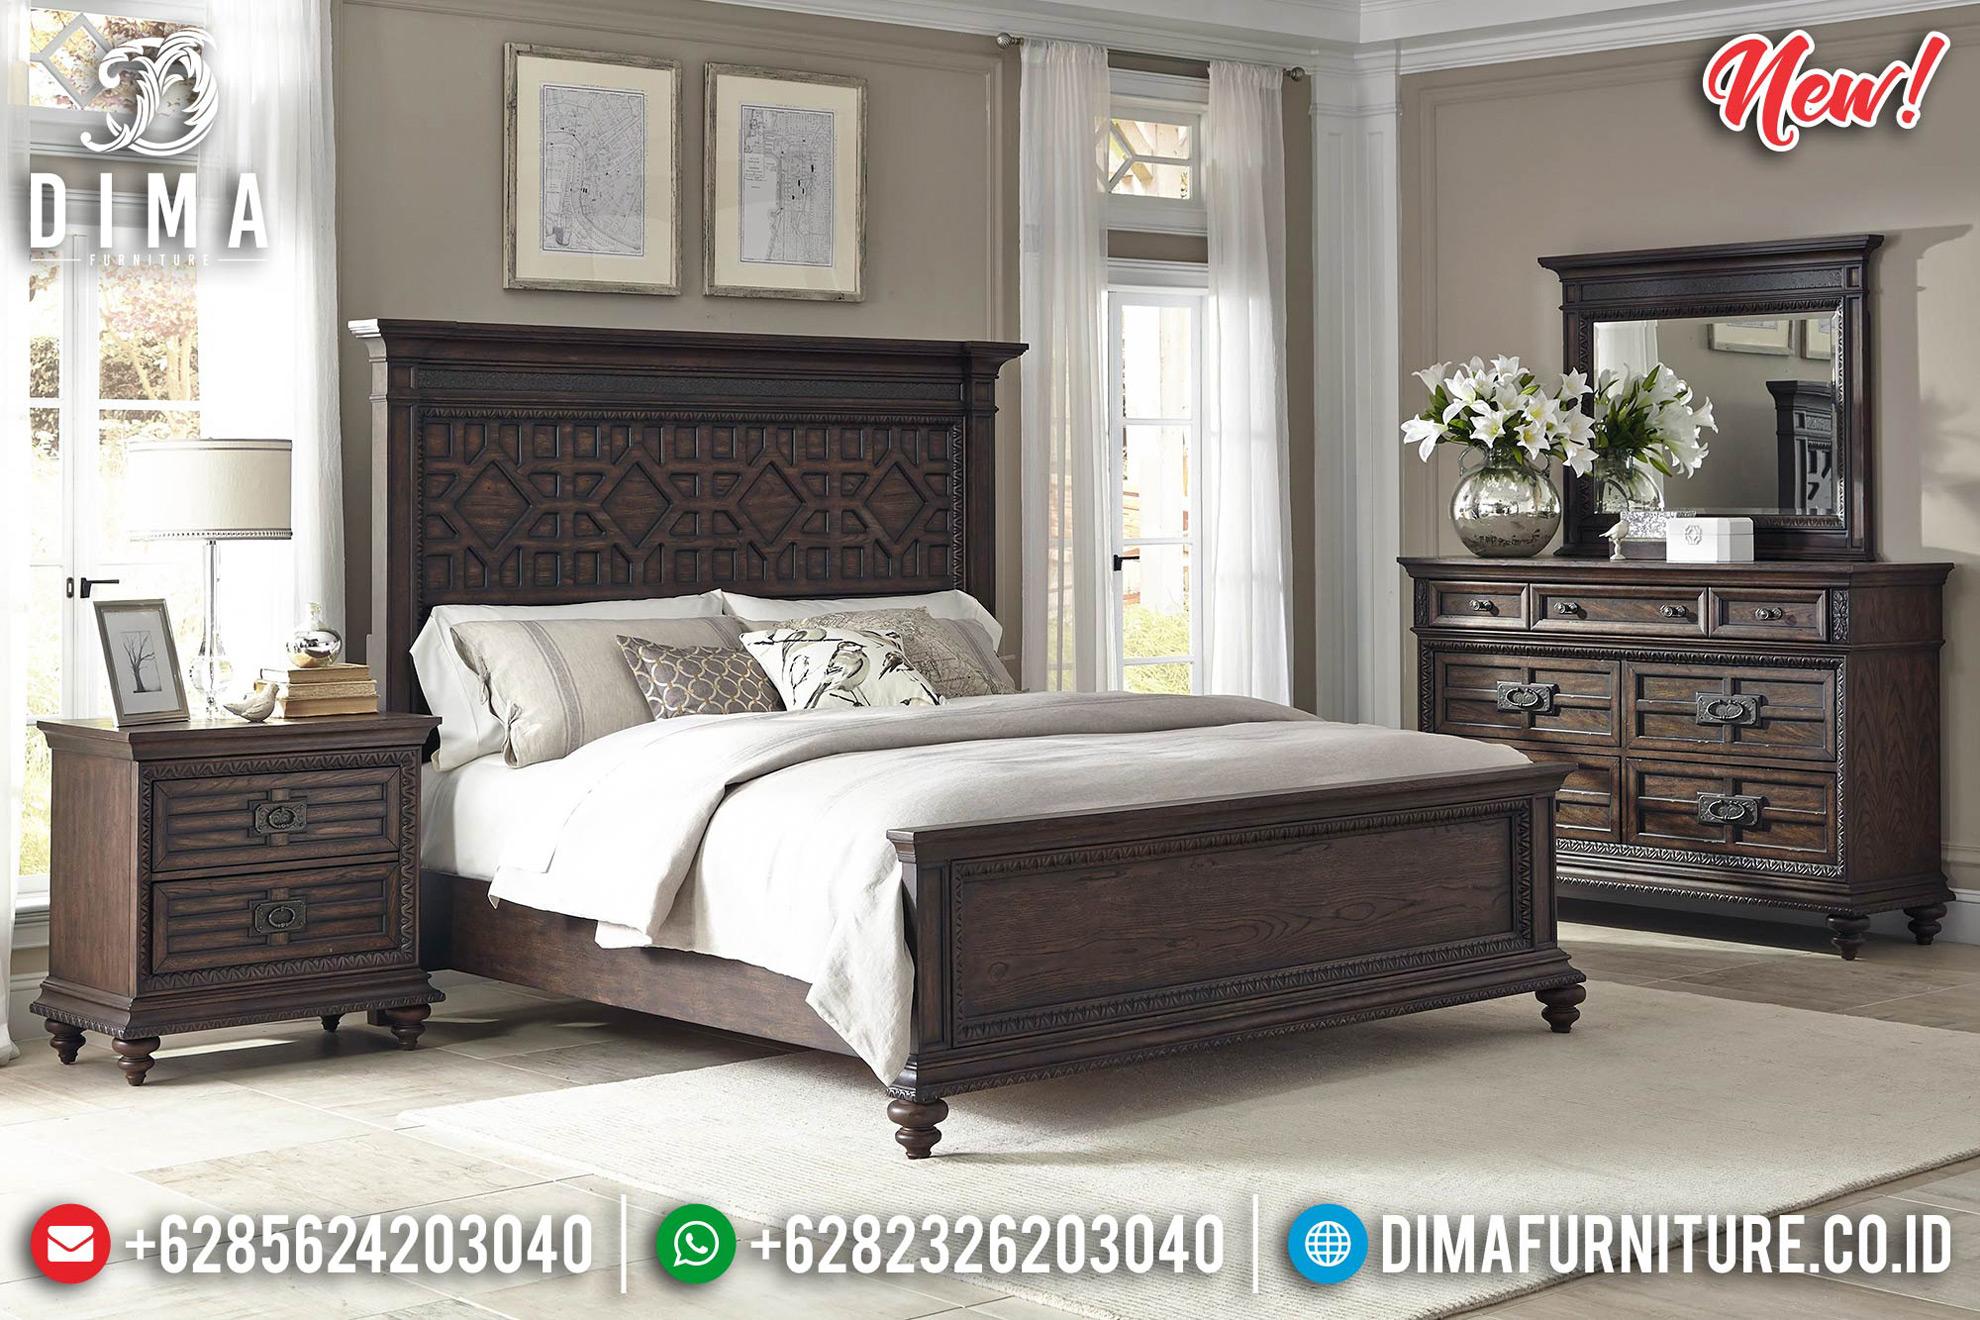 Tempat Tidur Minimalis Ukuran Queen New Modern Design Royals Natural Luxury MMJ-0745